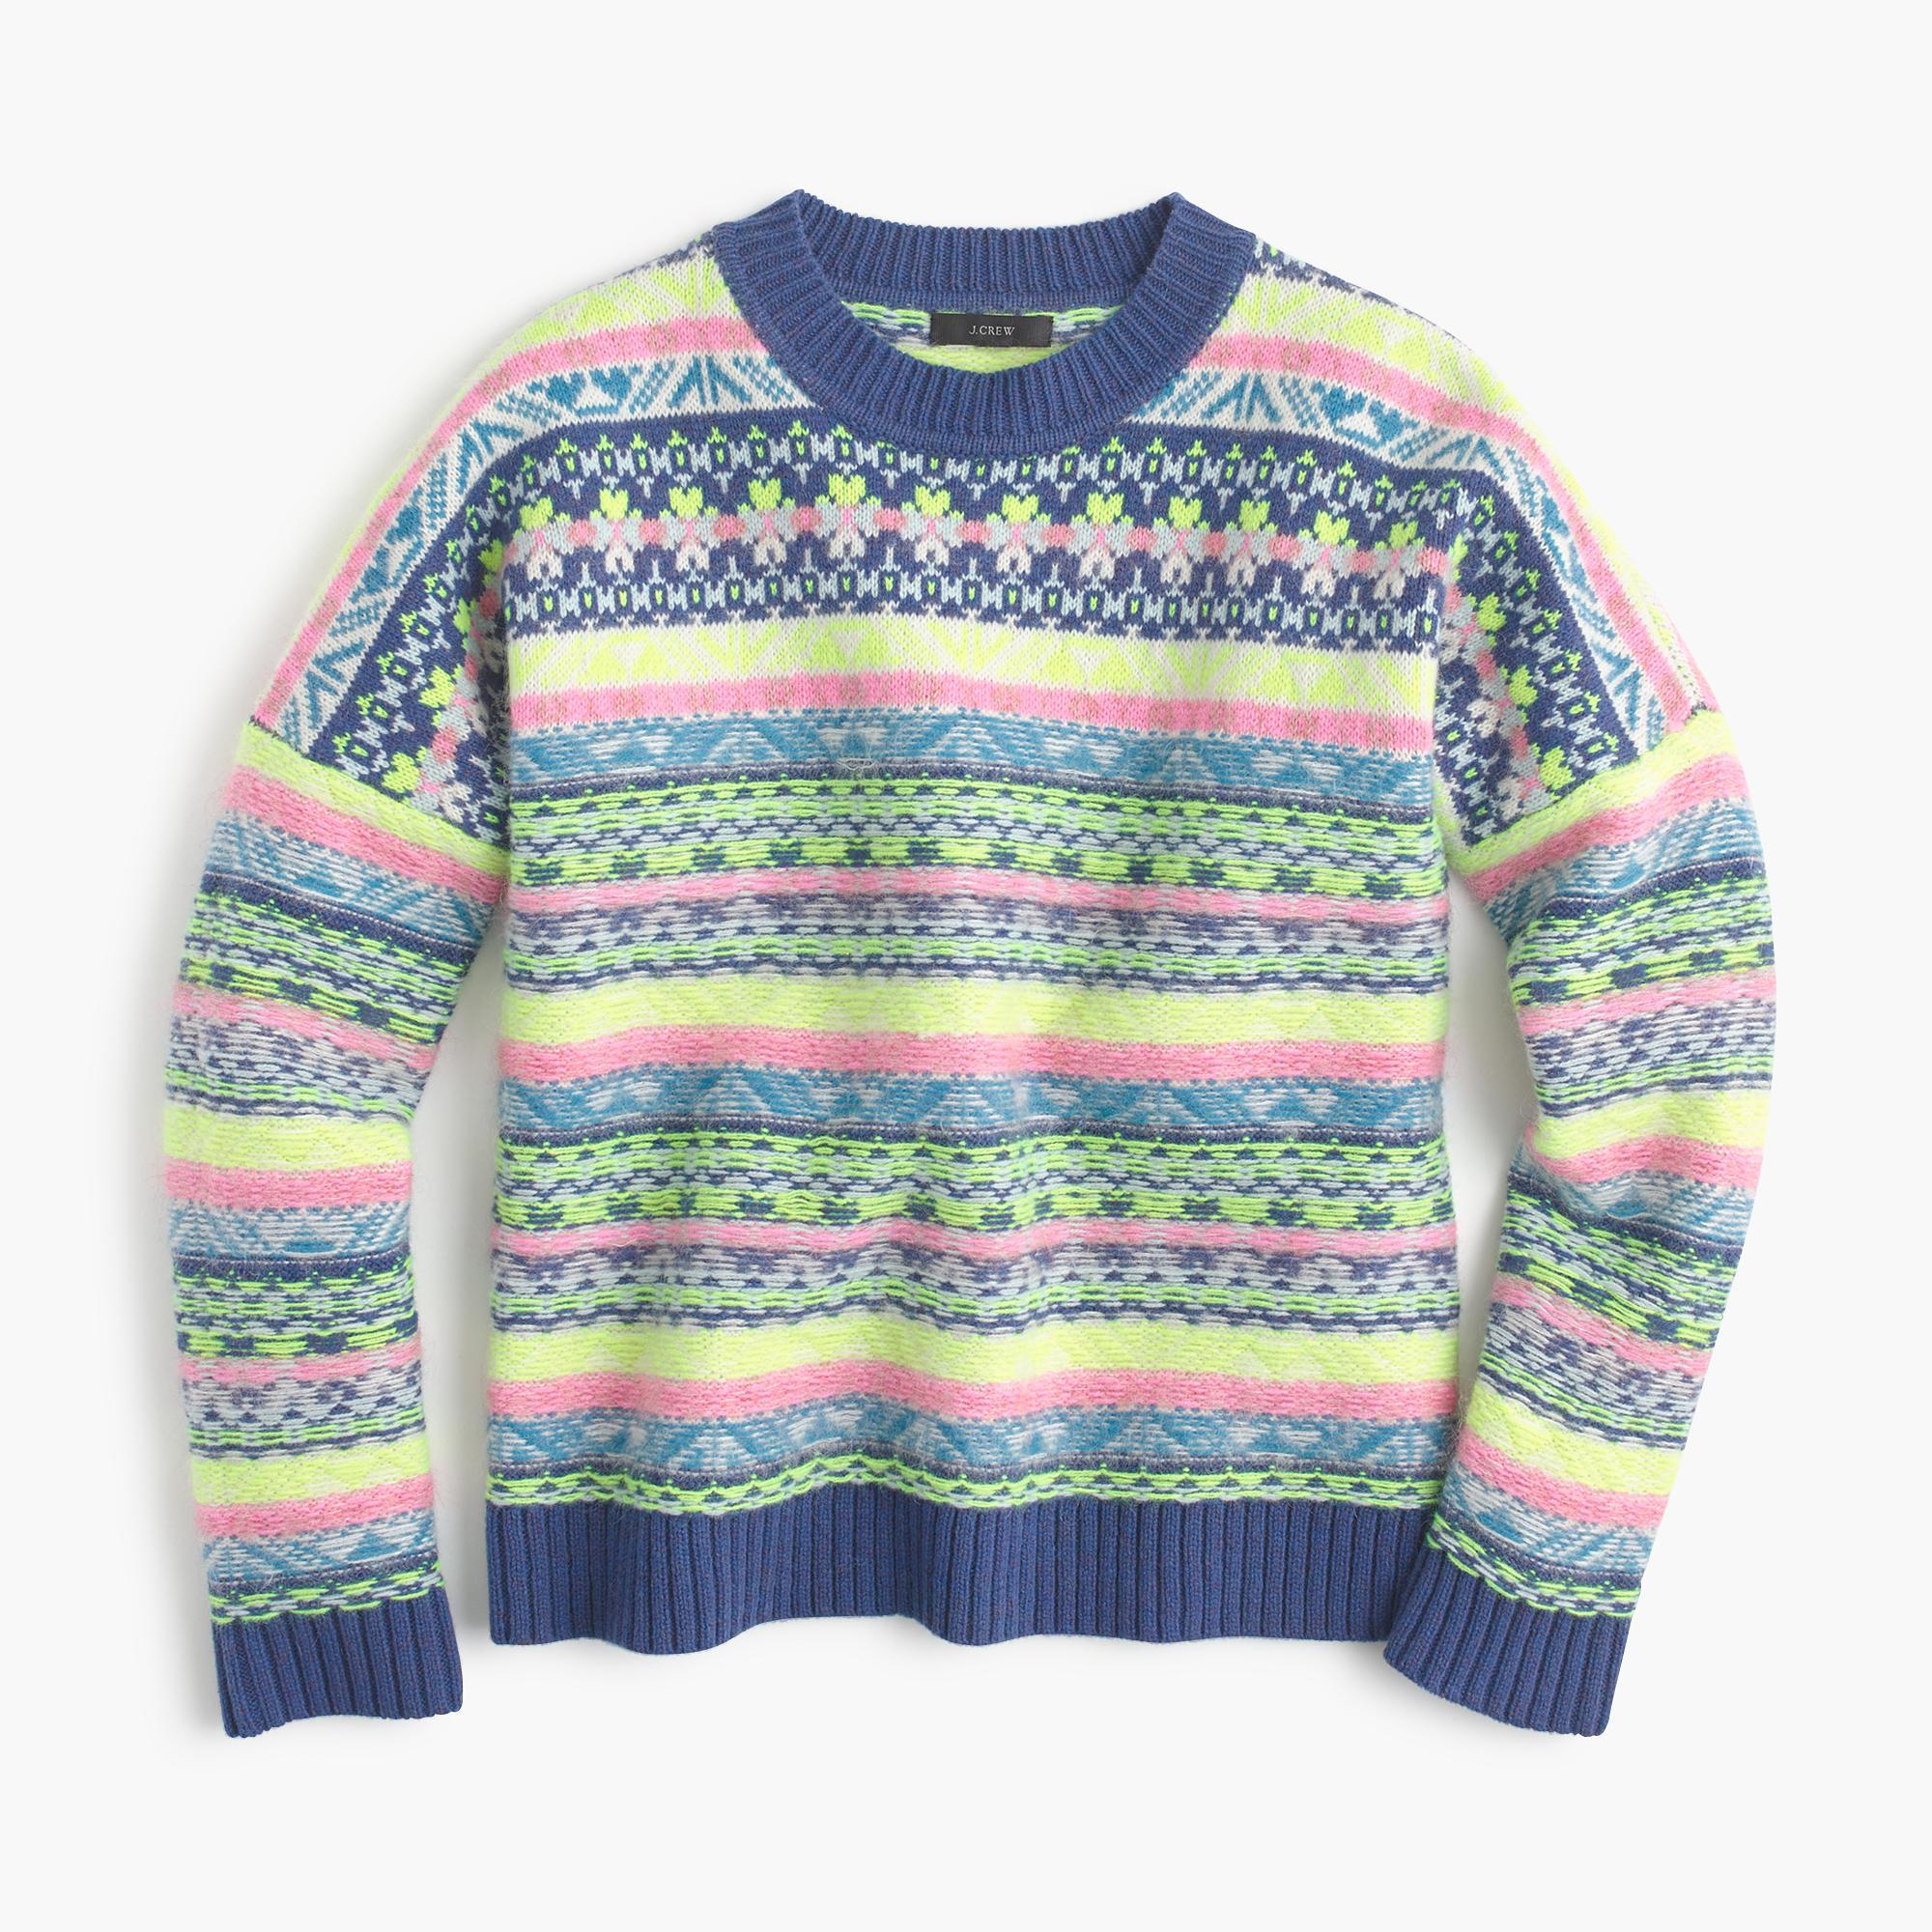 Lyst Jcrew Fair Isle Crewneck Sweater